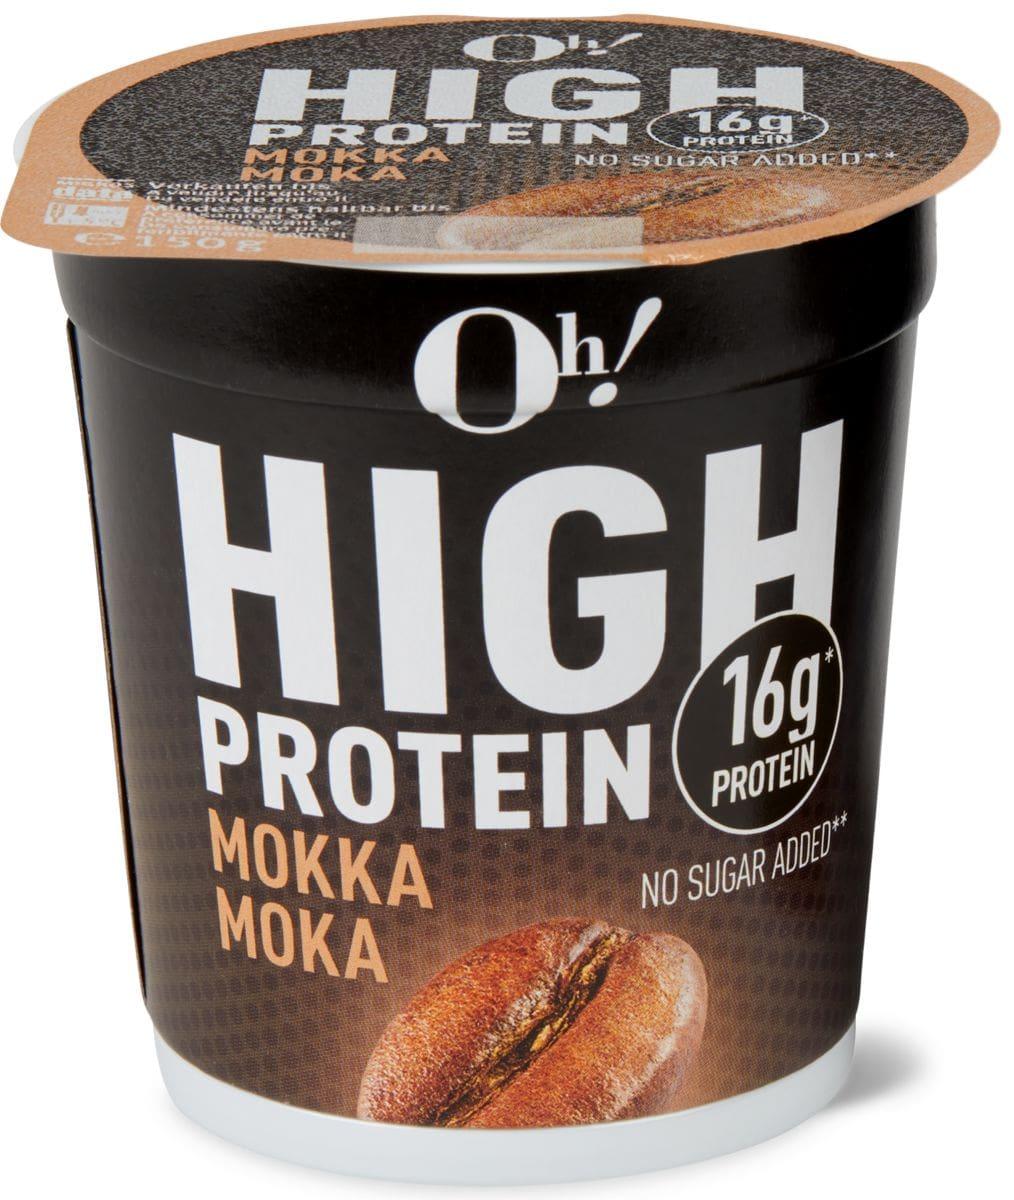 Oh! High Protein moka